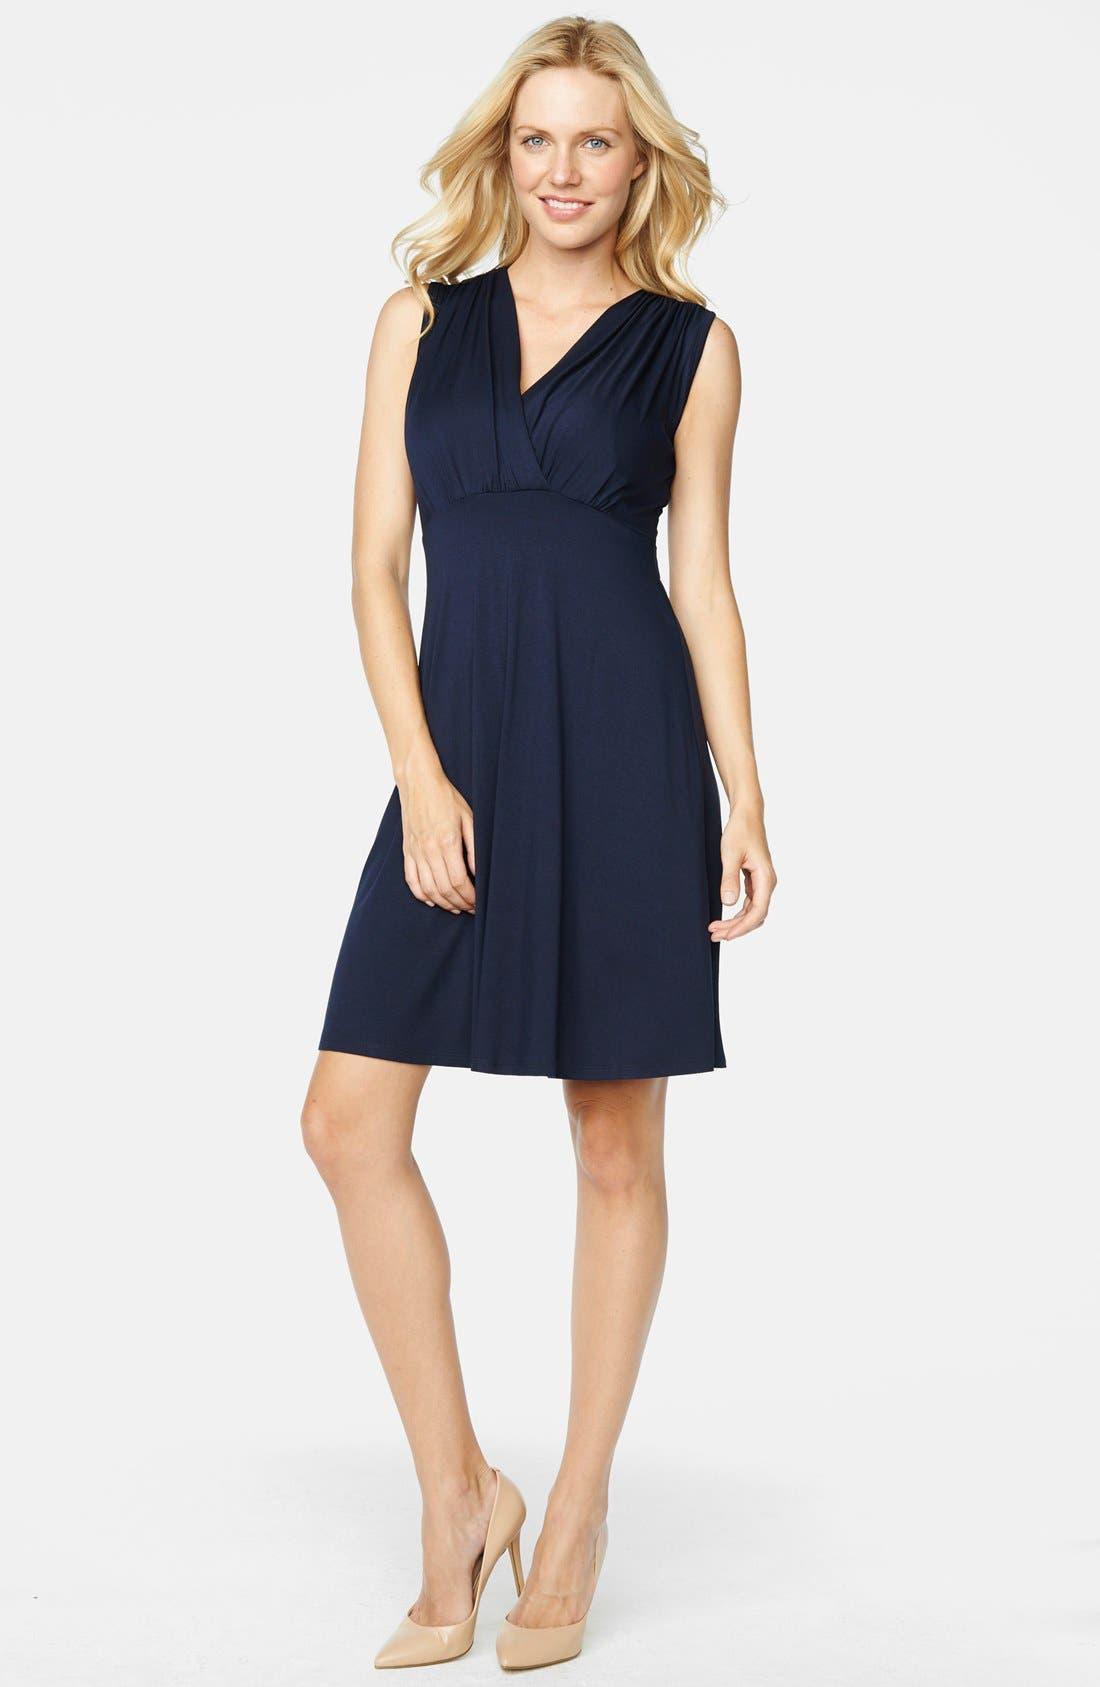 Maternal America Tummy Tuck Sleeveless Maternity/nursing Dress, Blue